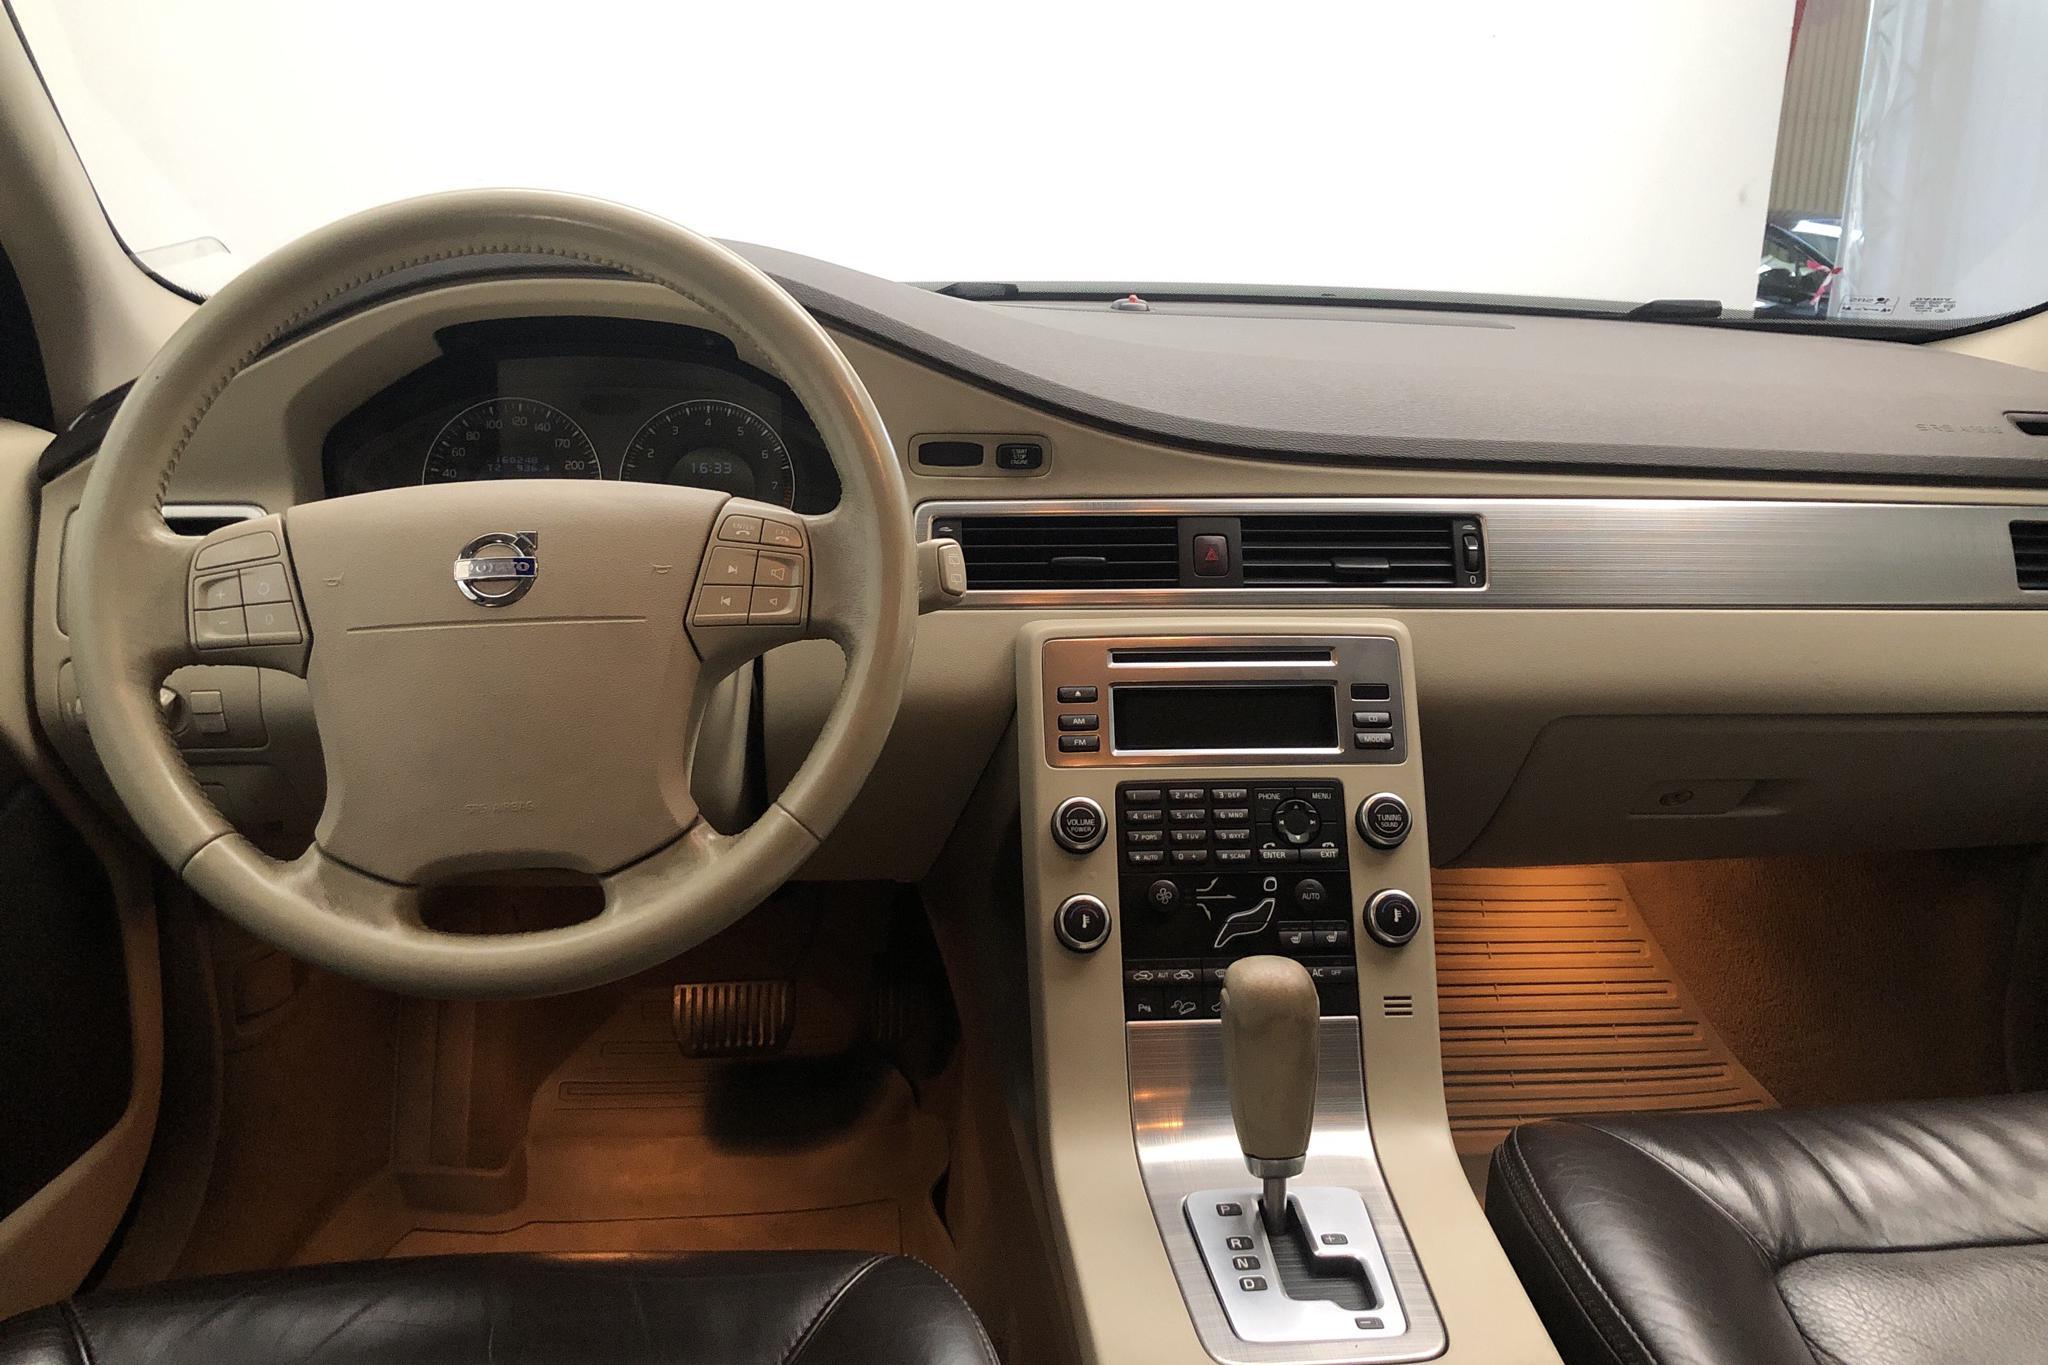 Volvo XC70 II 3.2 (238hk) - 160 250 km - Automatic - Light Green - 2008